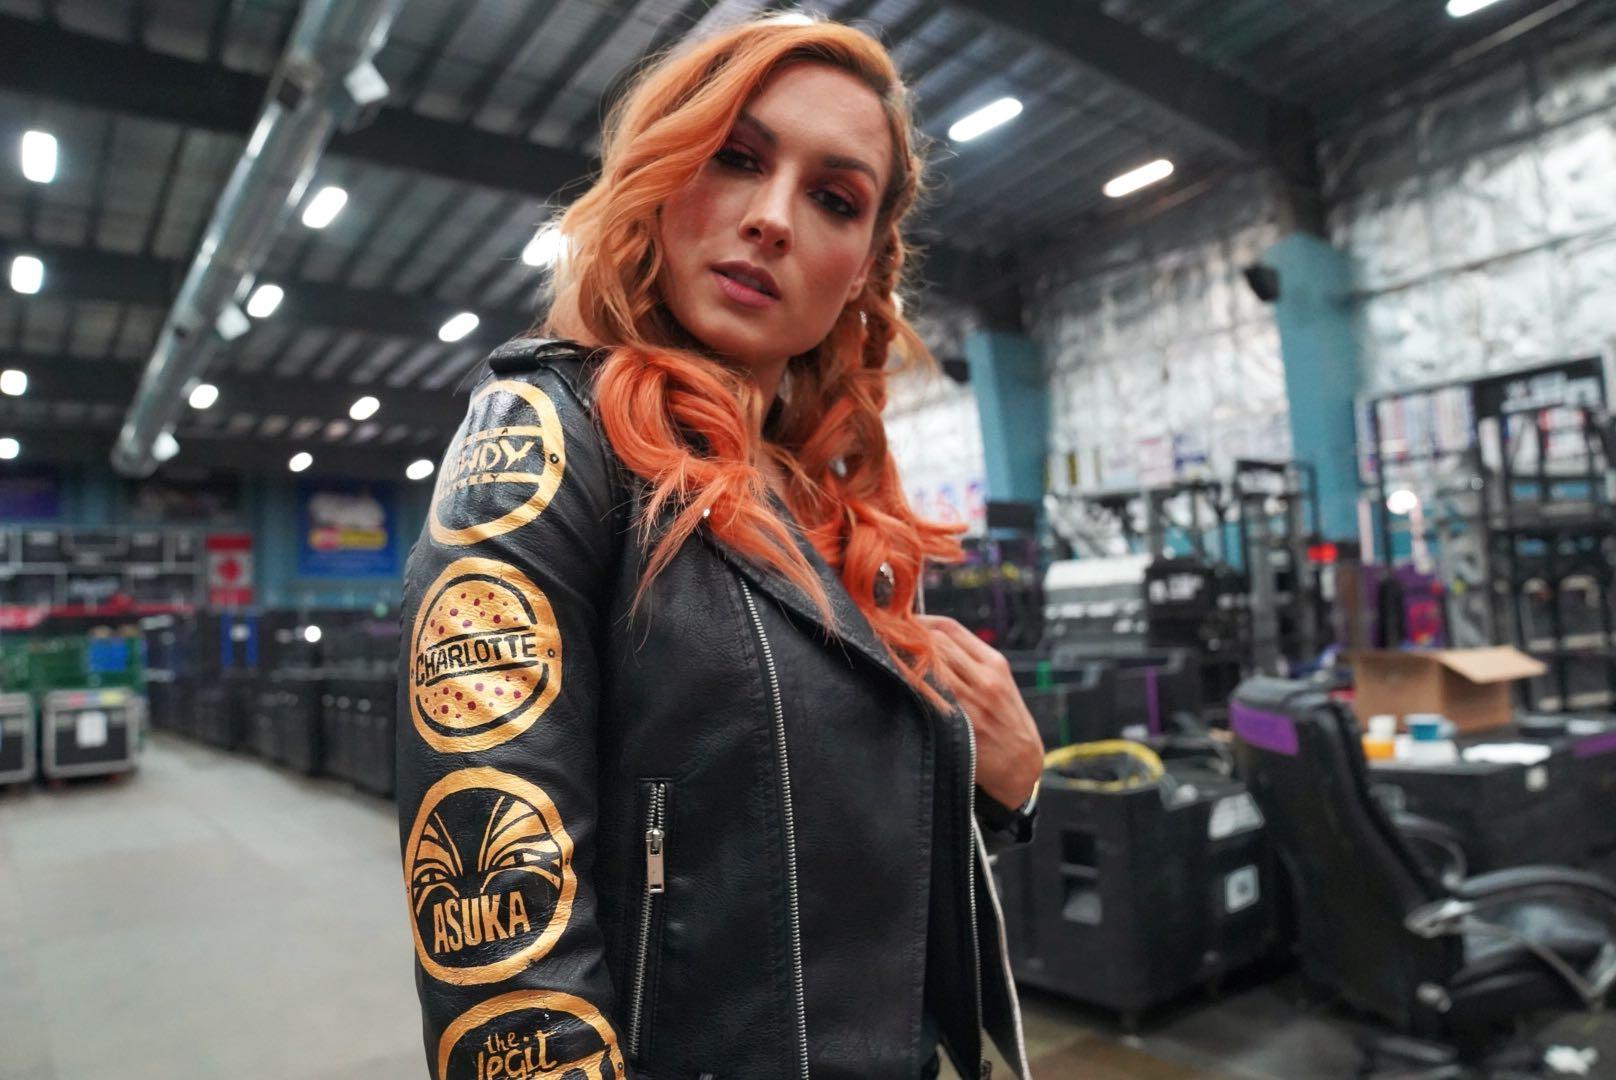 WWE Raw Preview (24/02/20): Randy Orton, Brock Lesnar, Super ShowDown Go-home 2